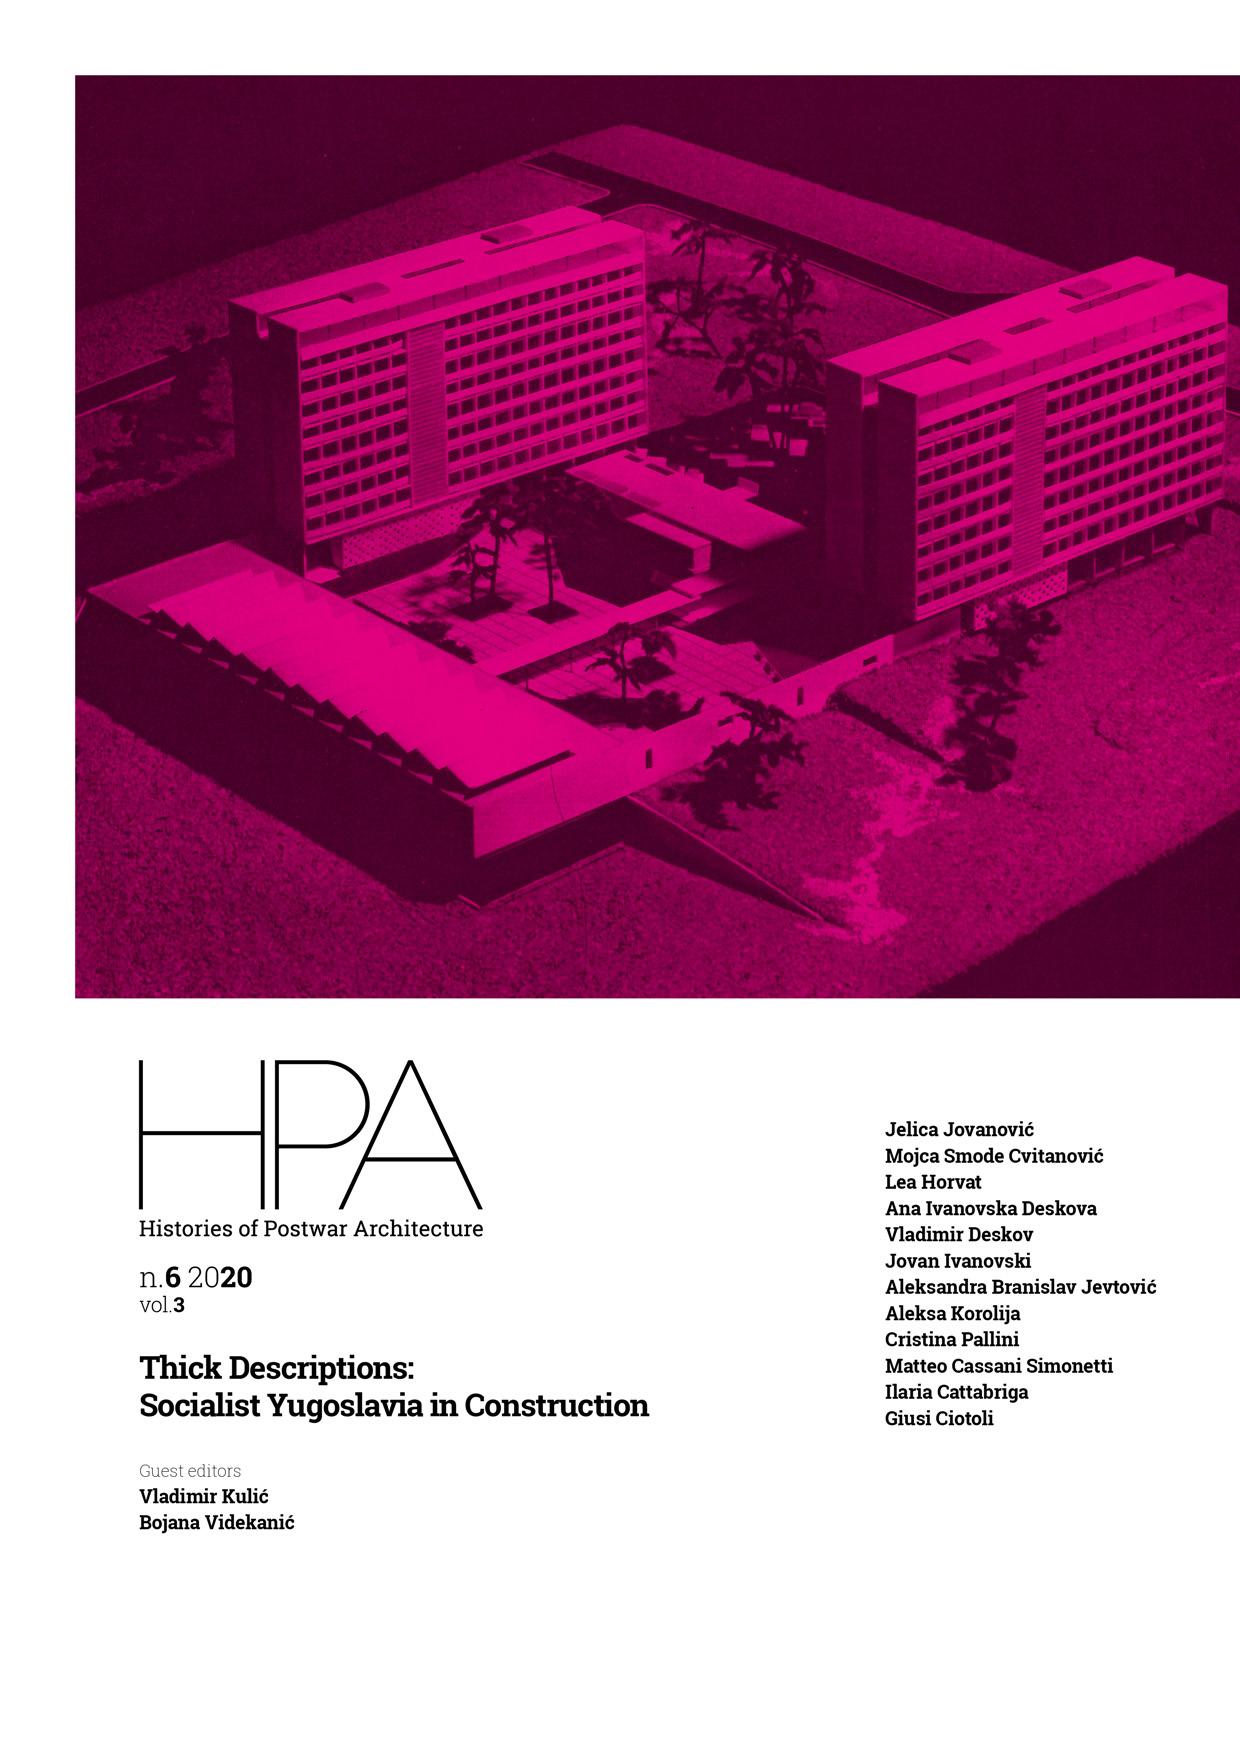 View No. 6 (2020): Thick Descriptions: Socialist Yugoslavia in Construction